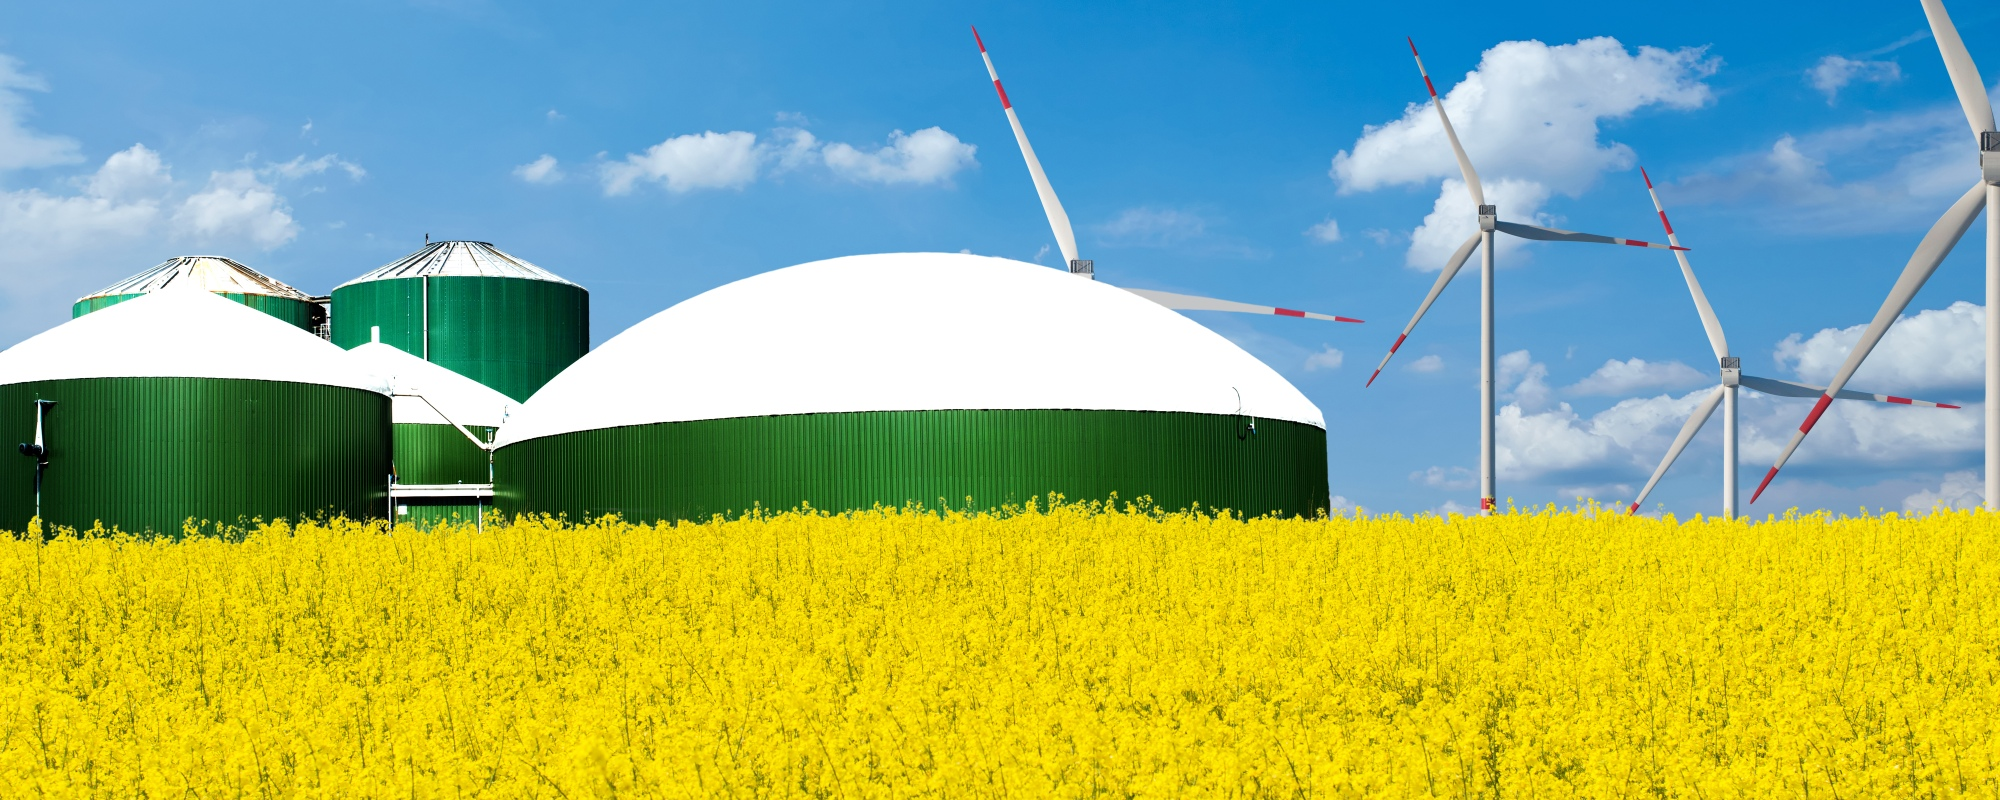 For Bio-Gas & Environmental